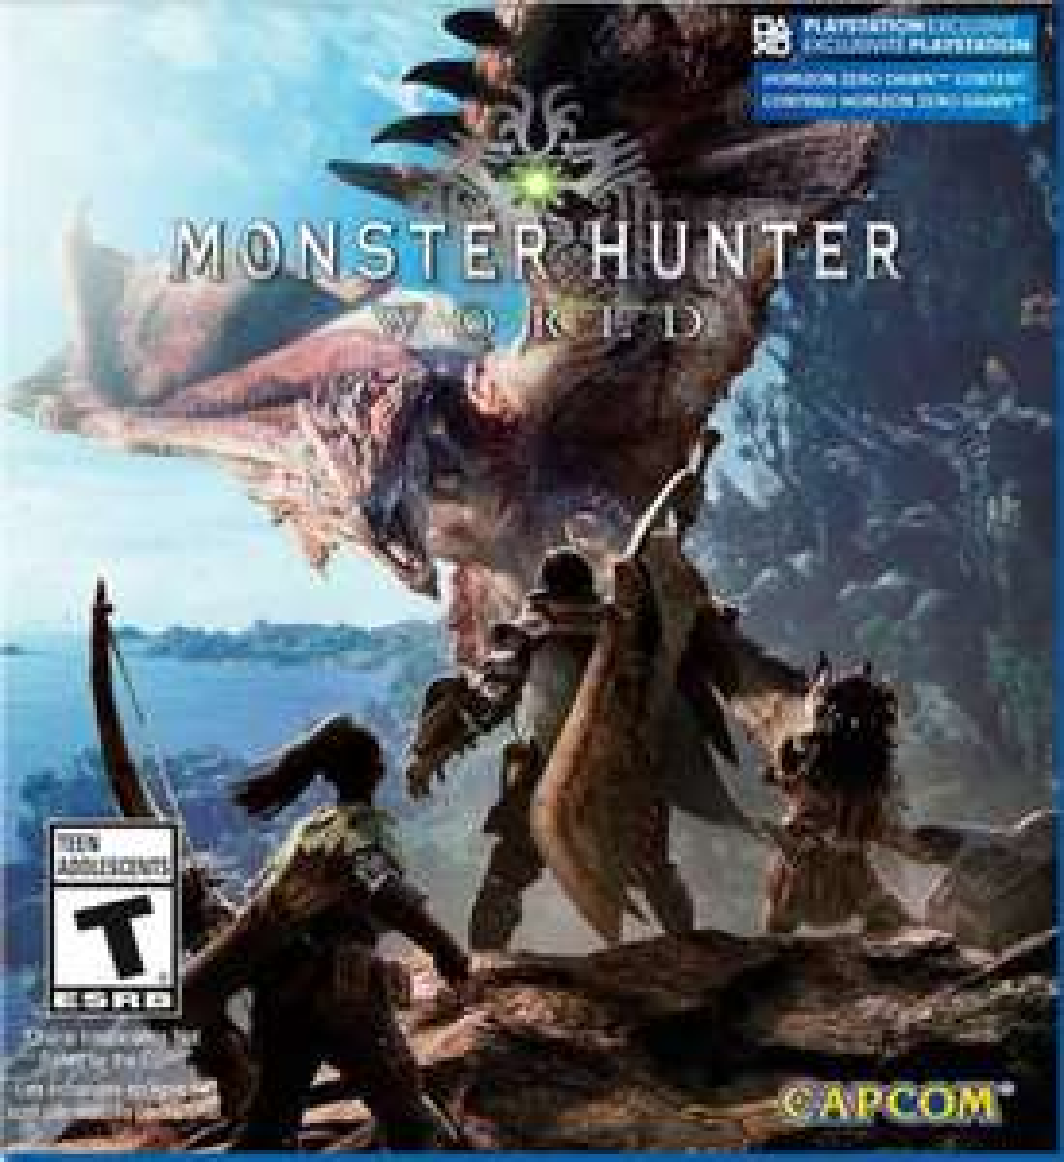 PlayStation Store: Monster Hunter World